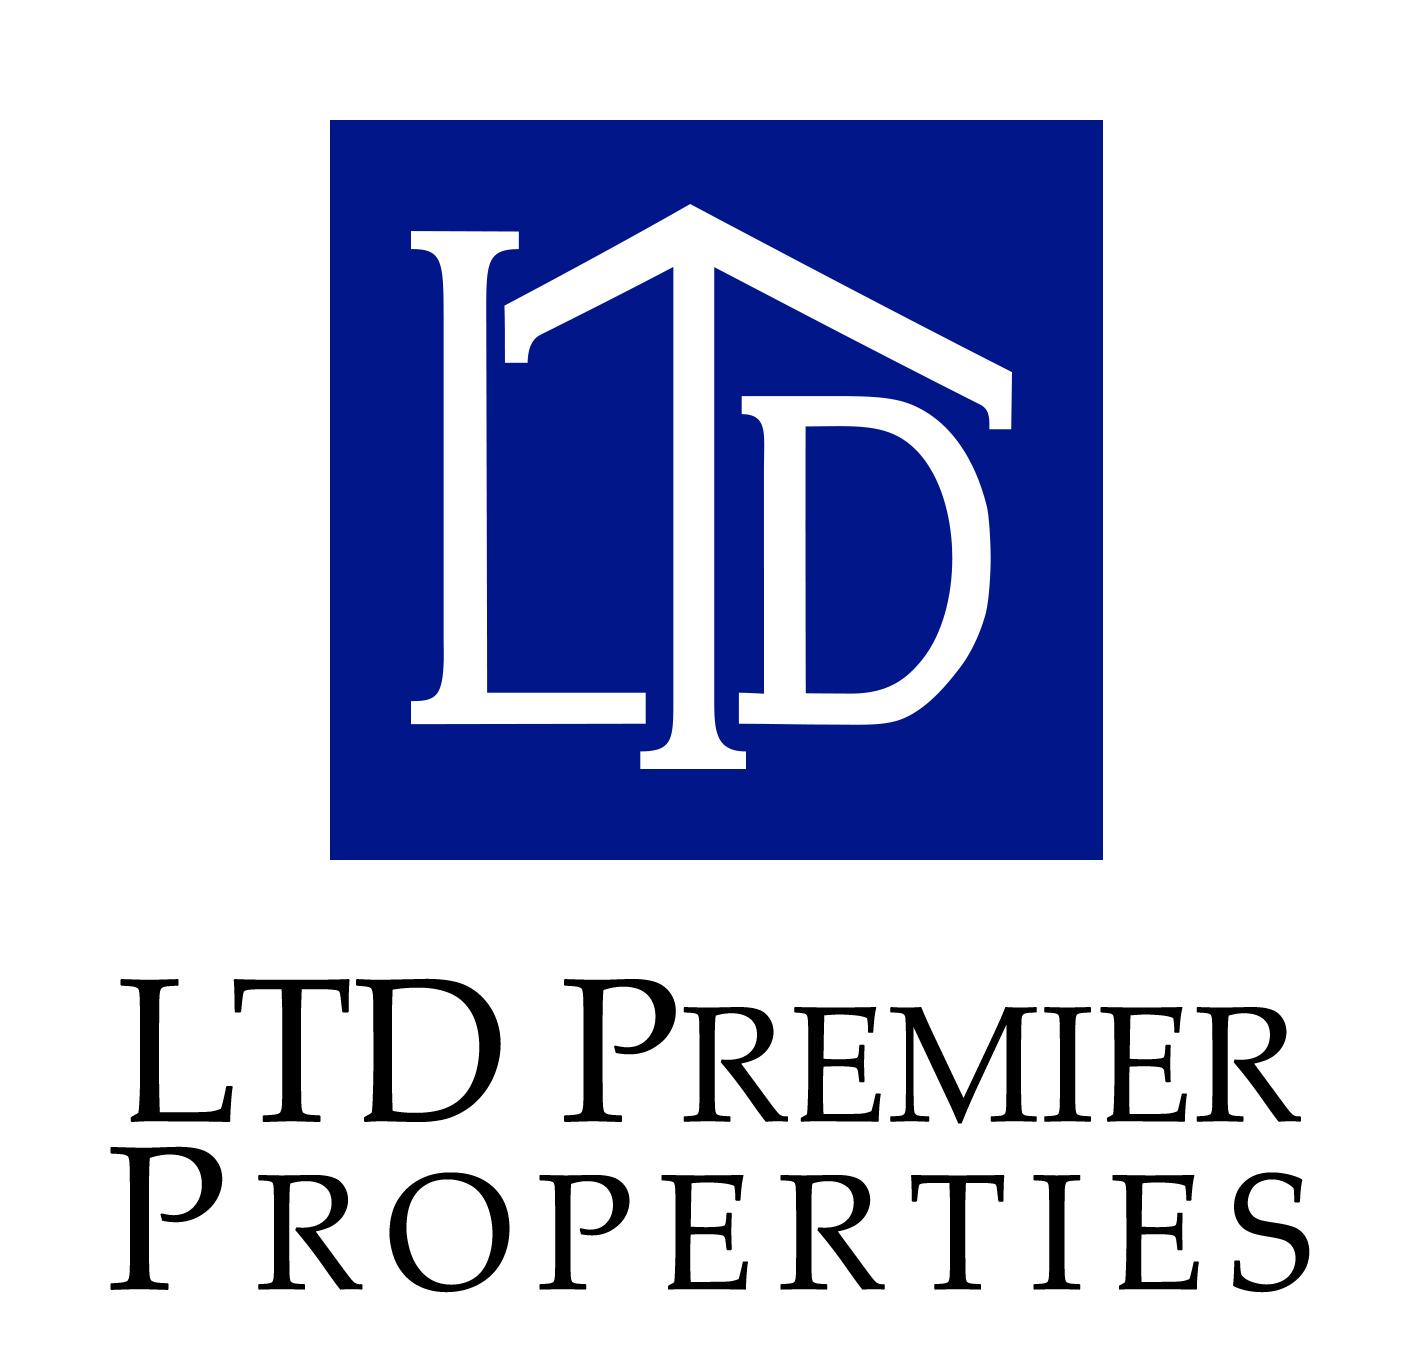 LTD Premier Properties